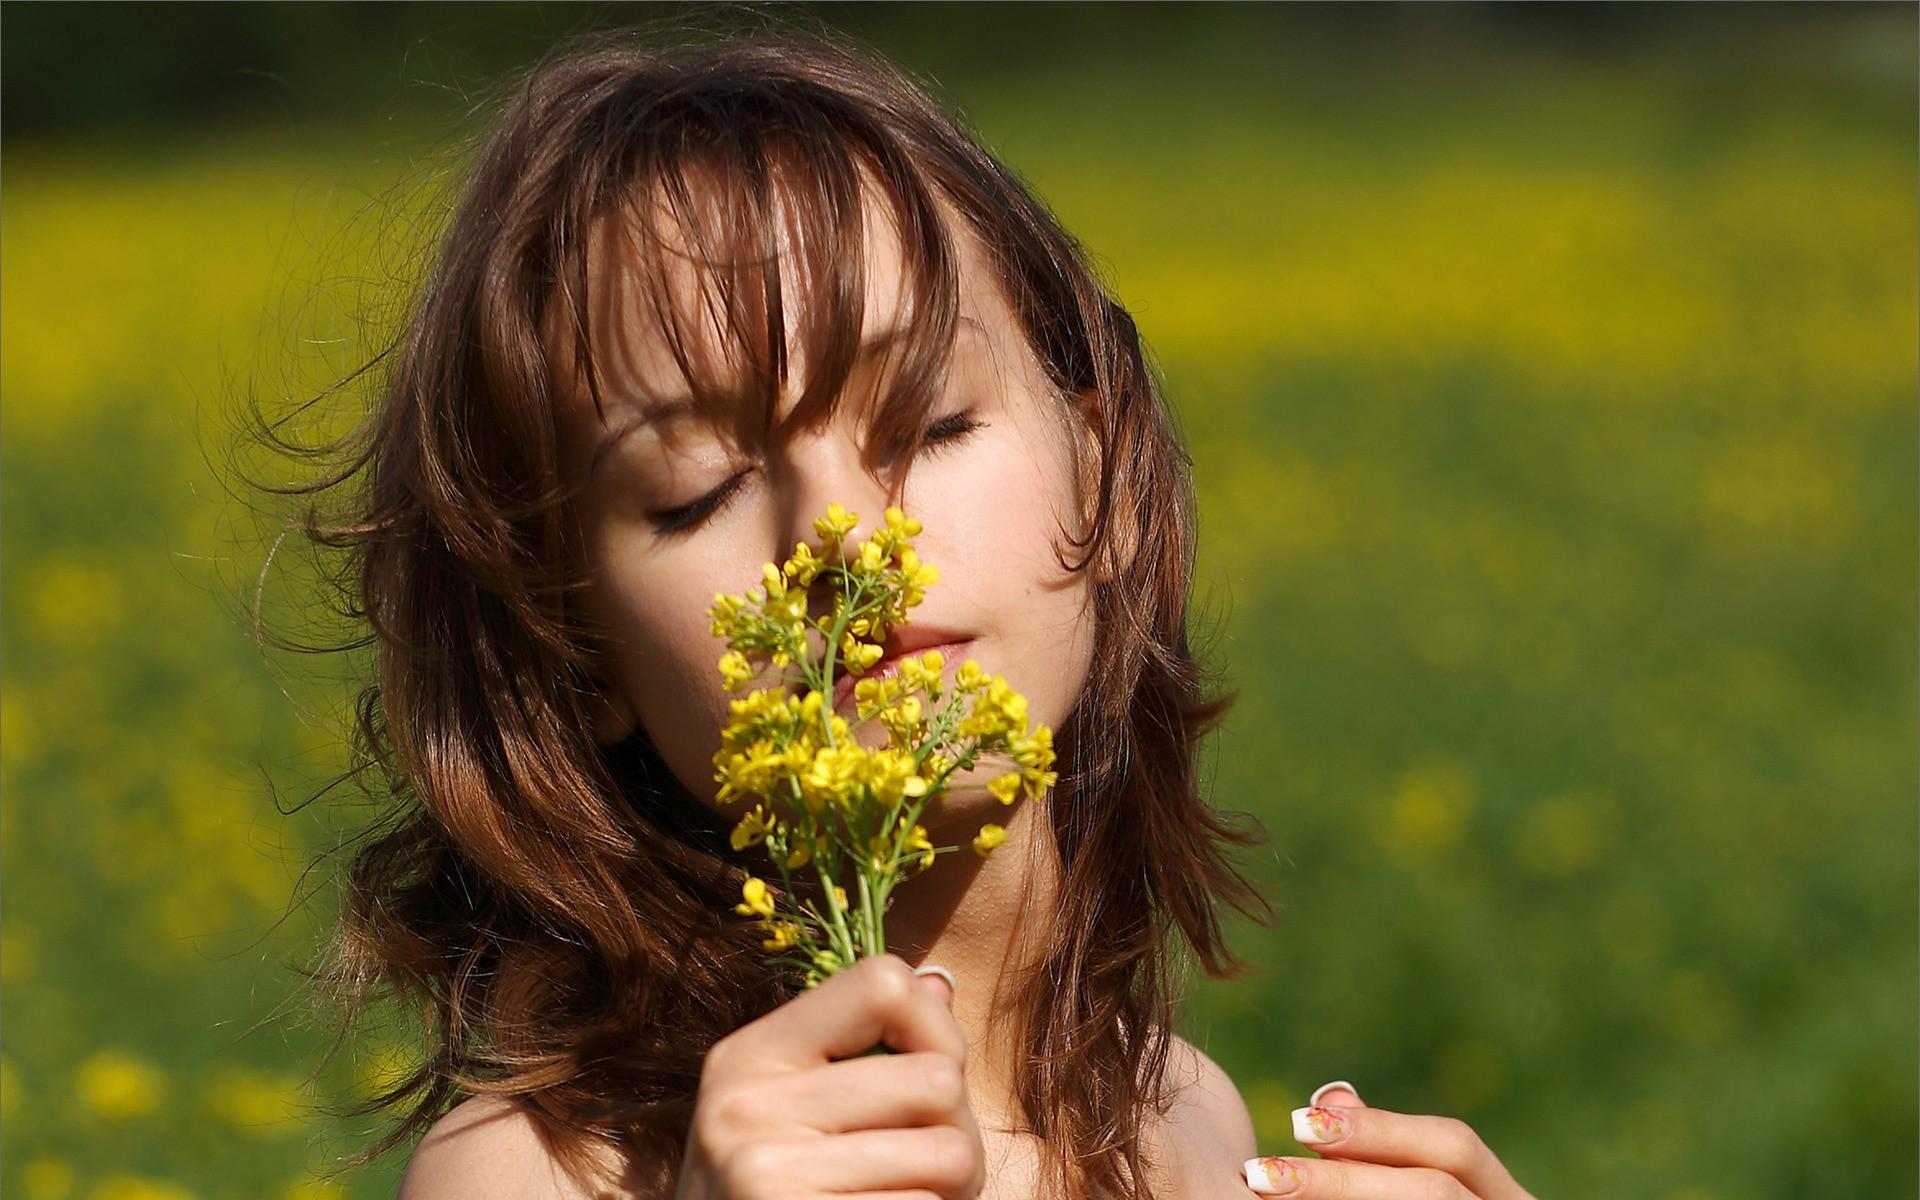 Chica oliendo flores - 1920x1200